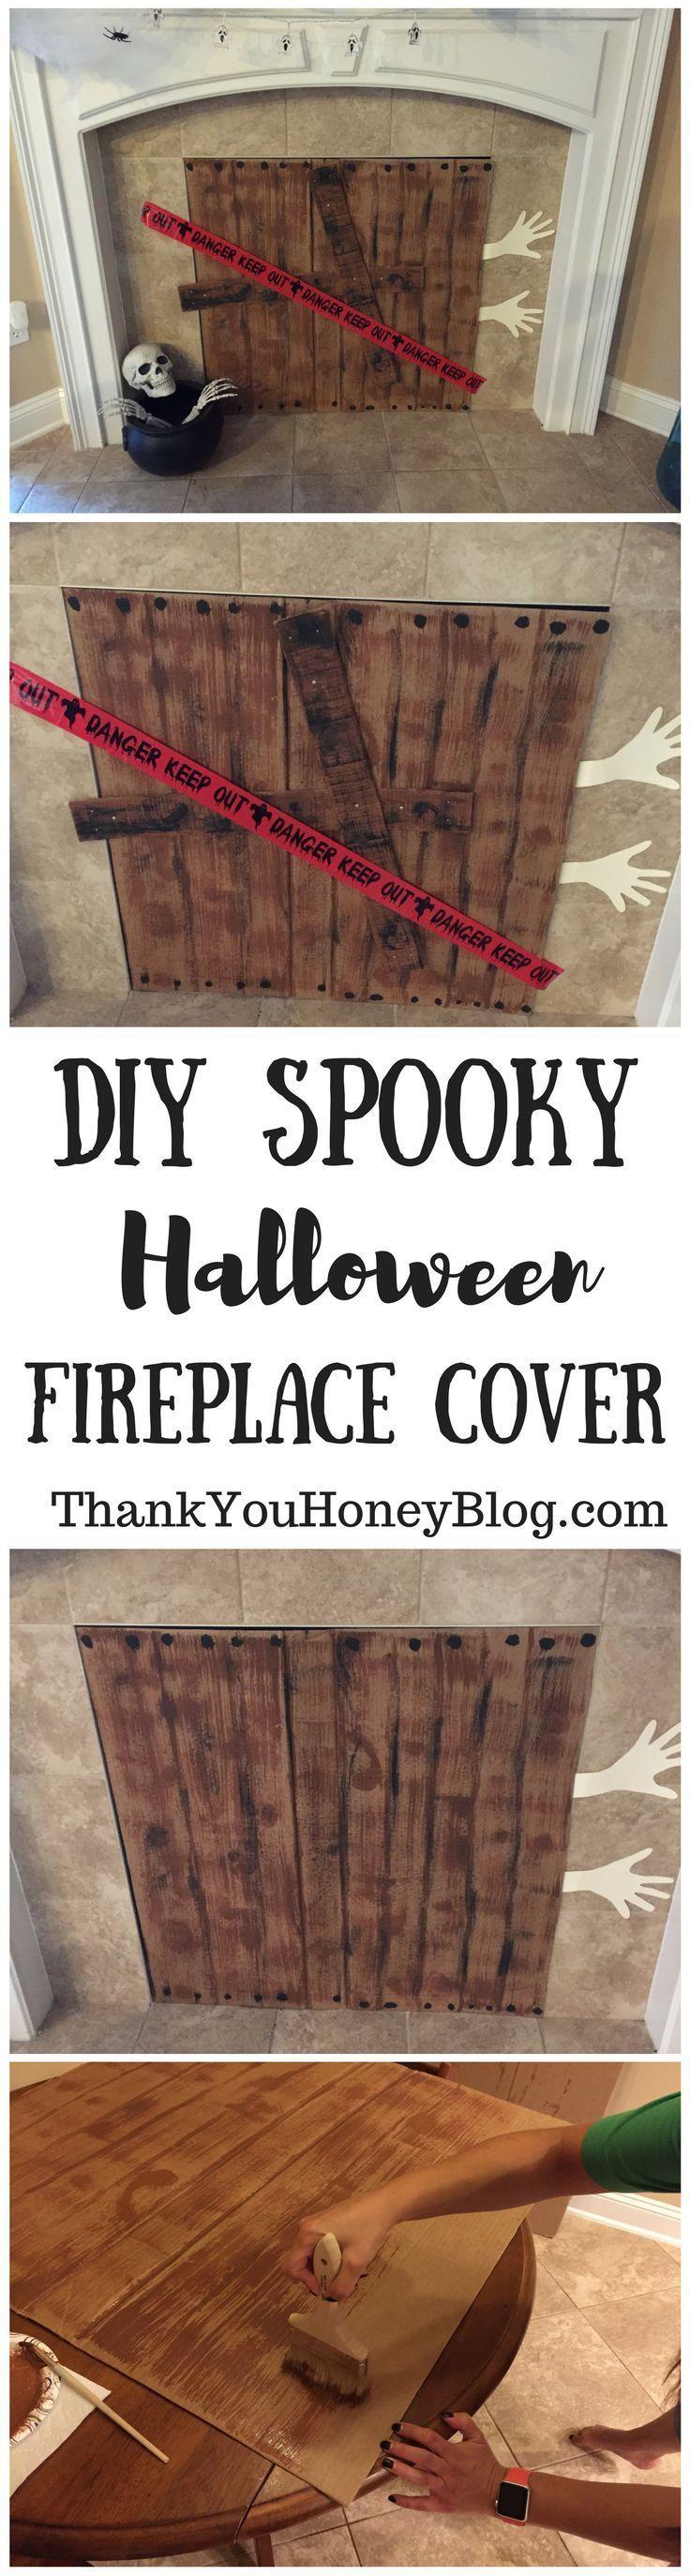 DIY Spooky Halloween Fireplace Cover Halloween fireplace - scary halloween decor